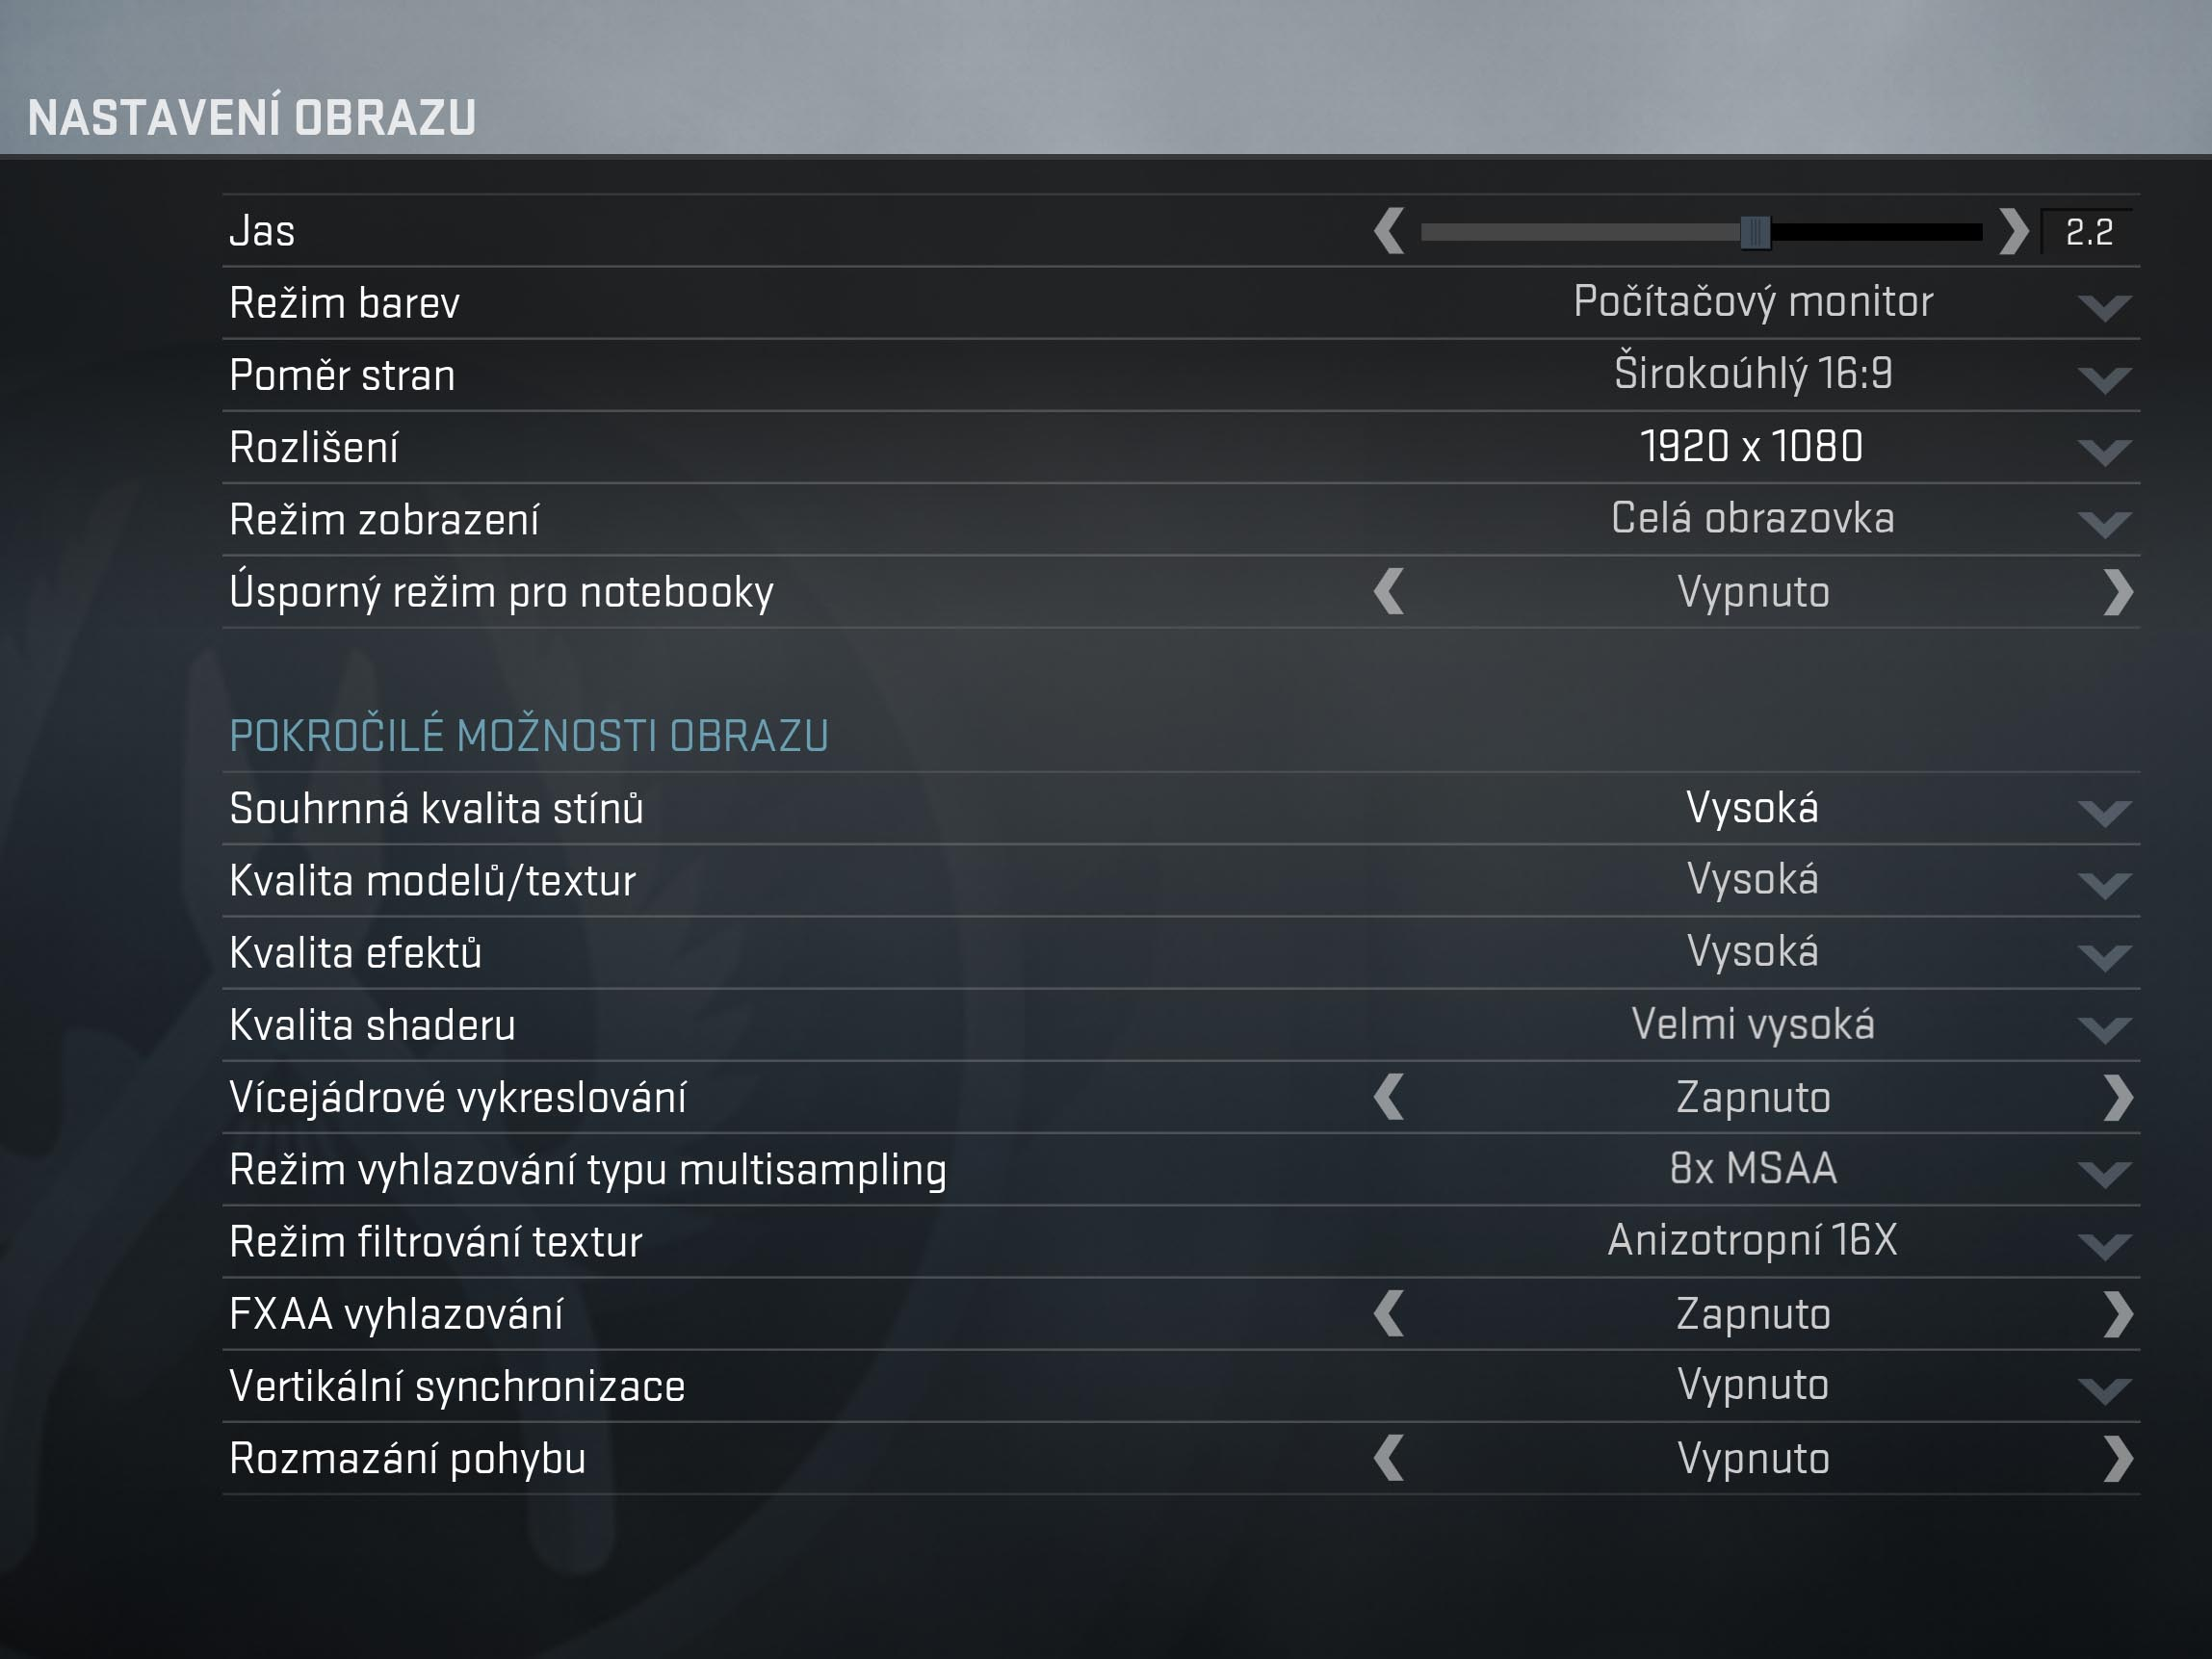 CS:Gloal Offensive nastavení detailů